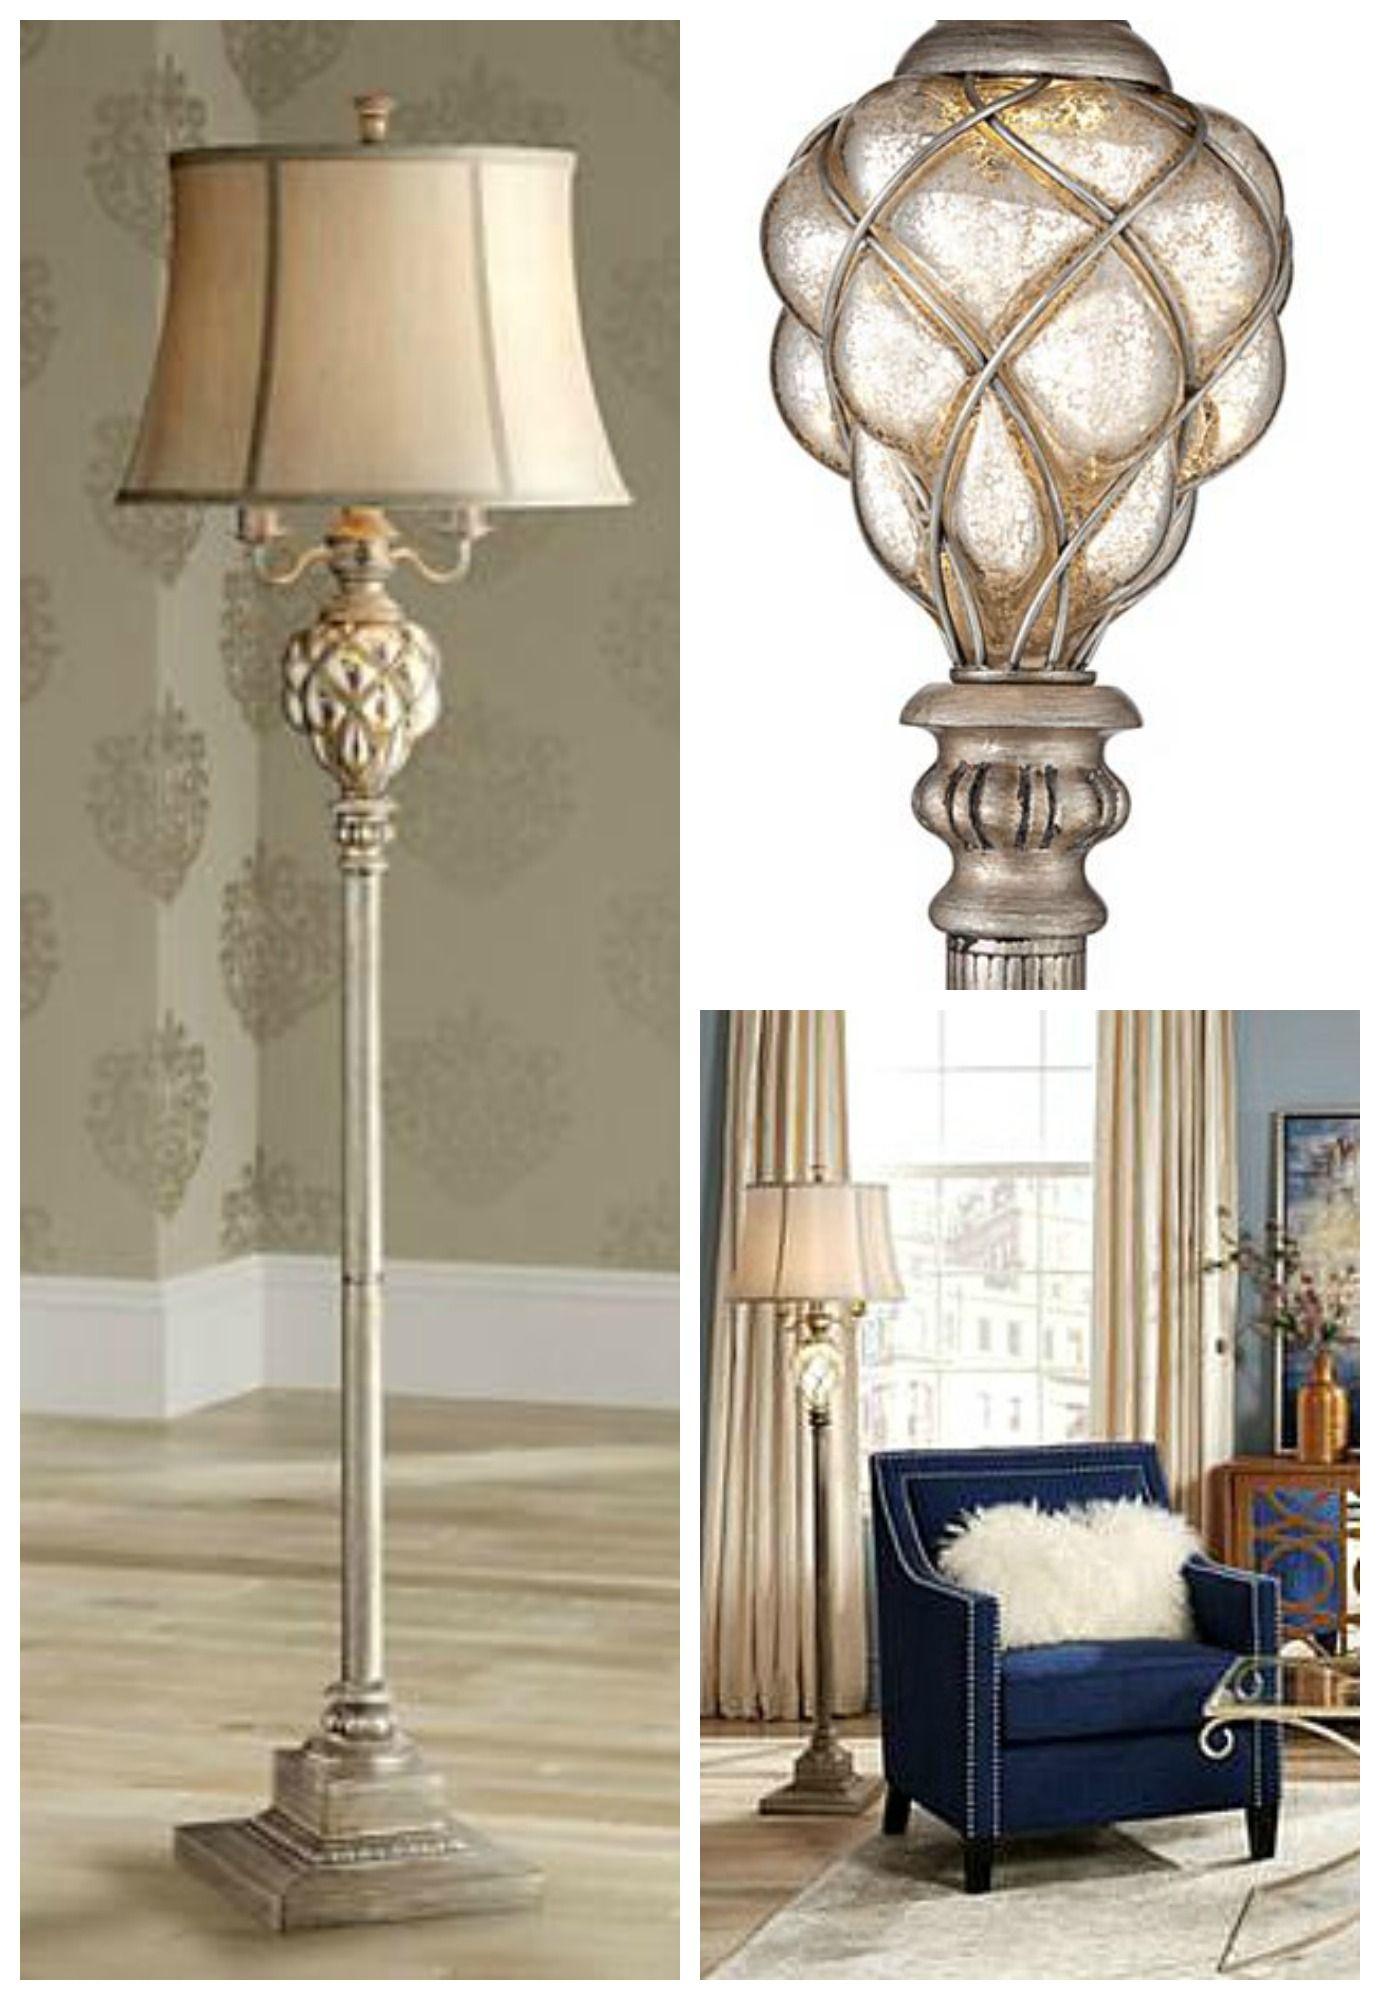 Olde 4 Light Floor Lamp With Led Night Light 3c563 Lamps Plus Floor Lamp Floor Lamp Shades Floor Lights